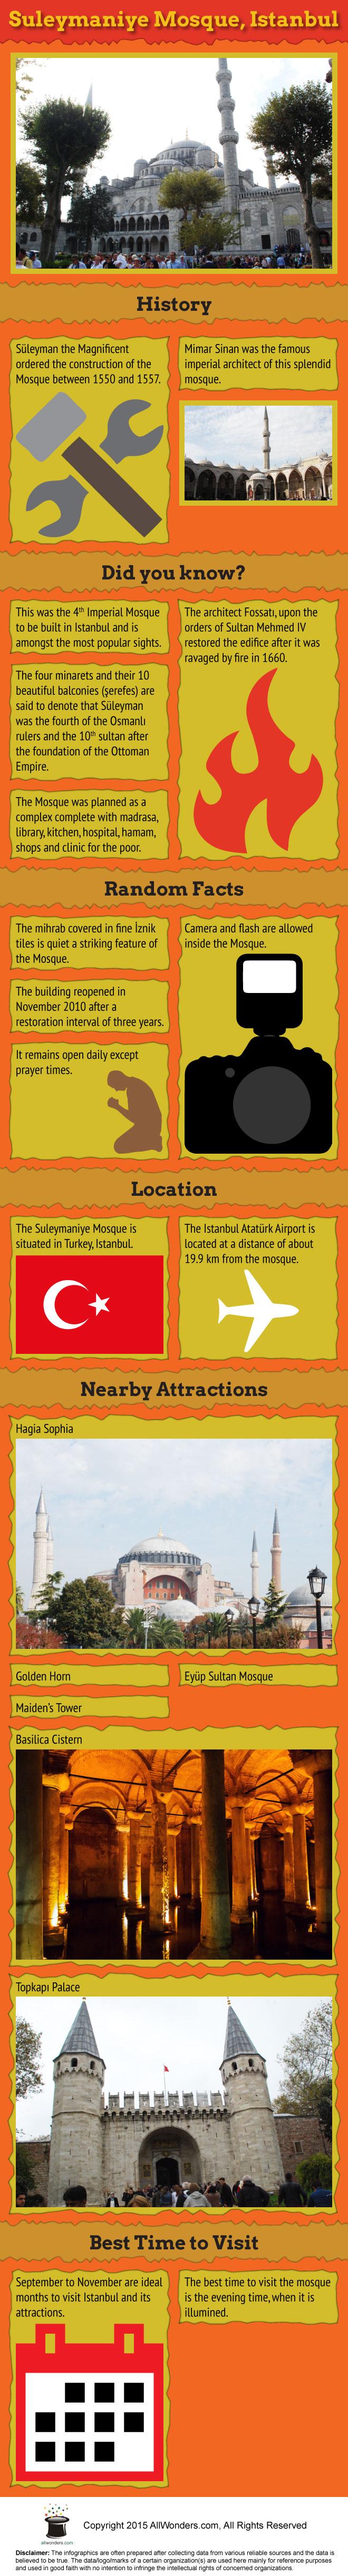 Infographic on Suleymaniye Mosque